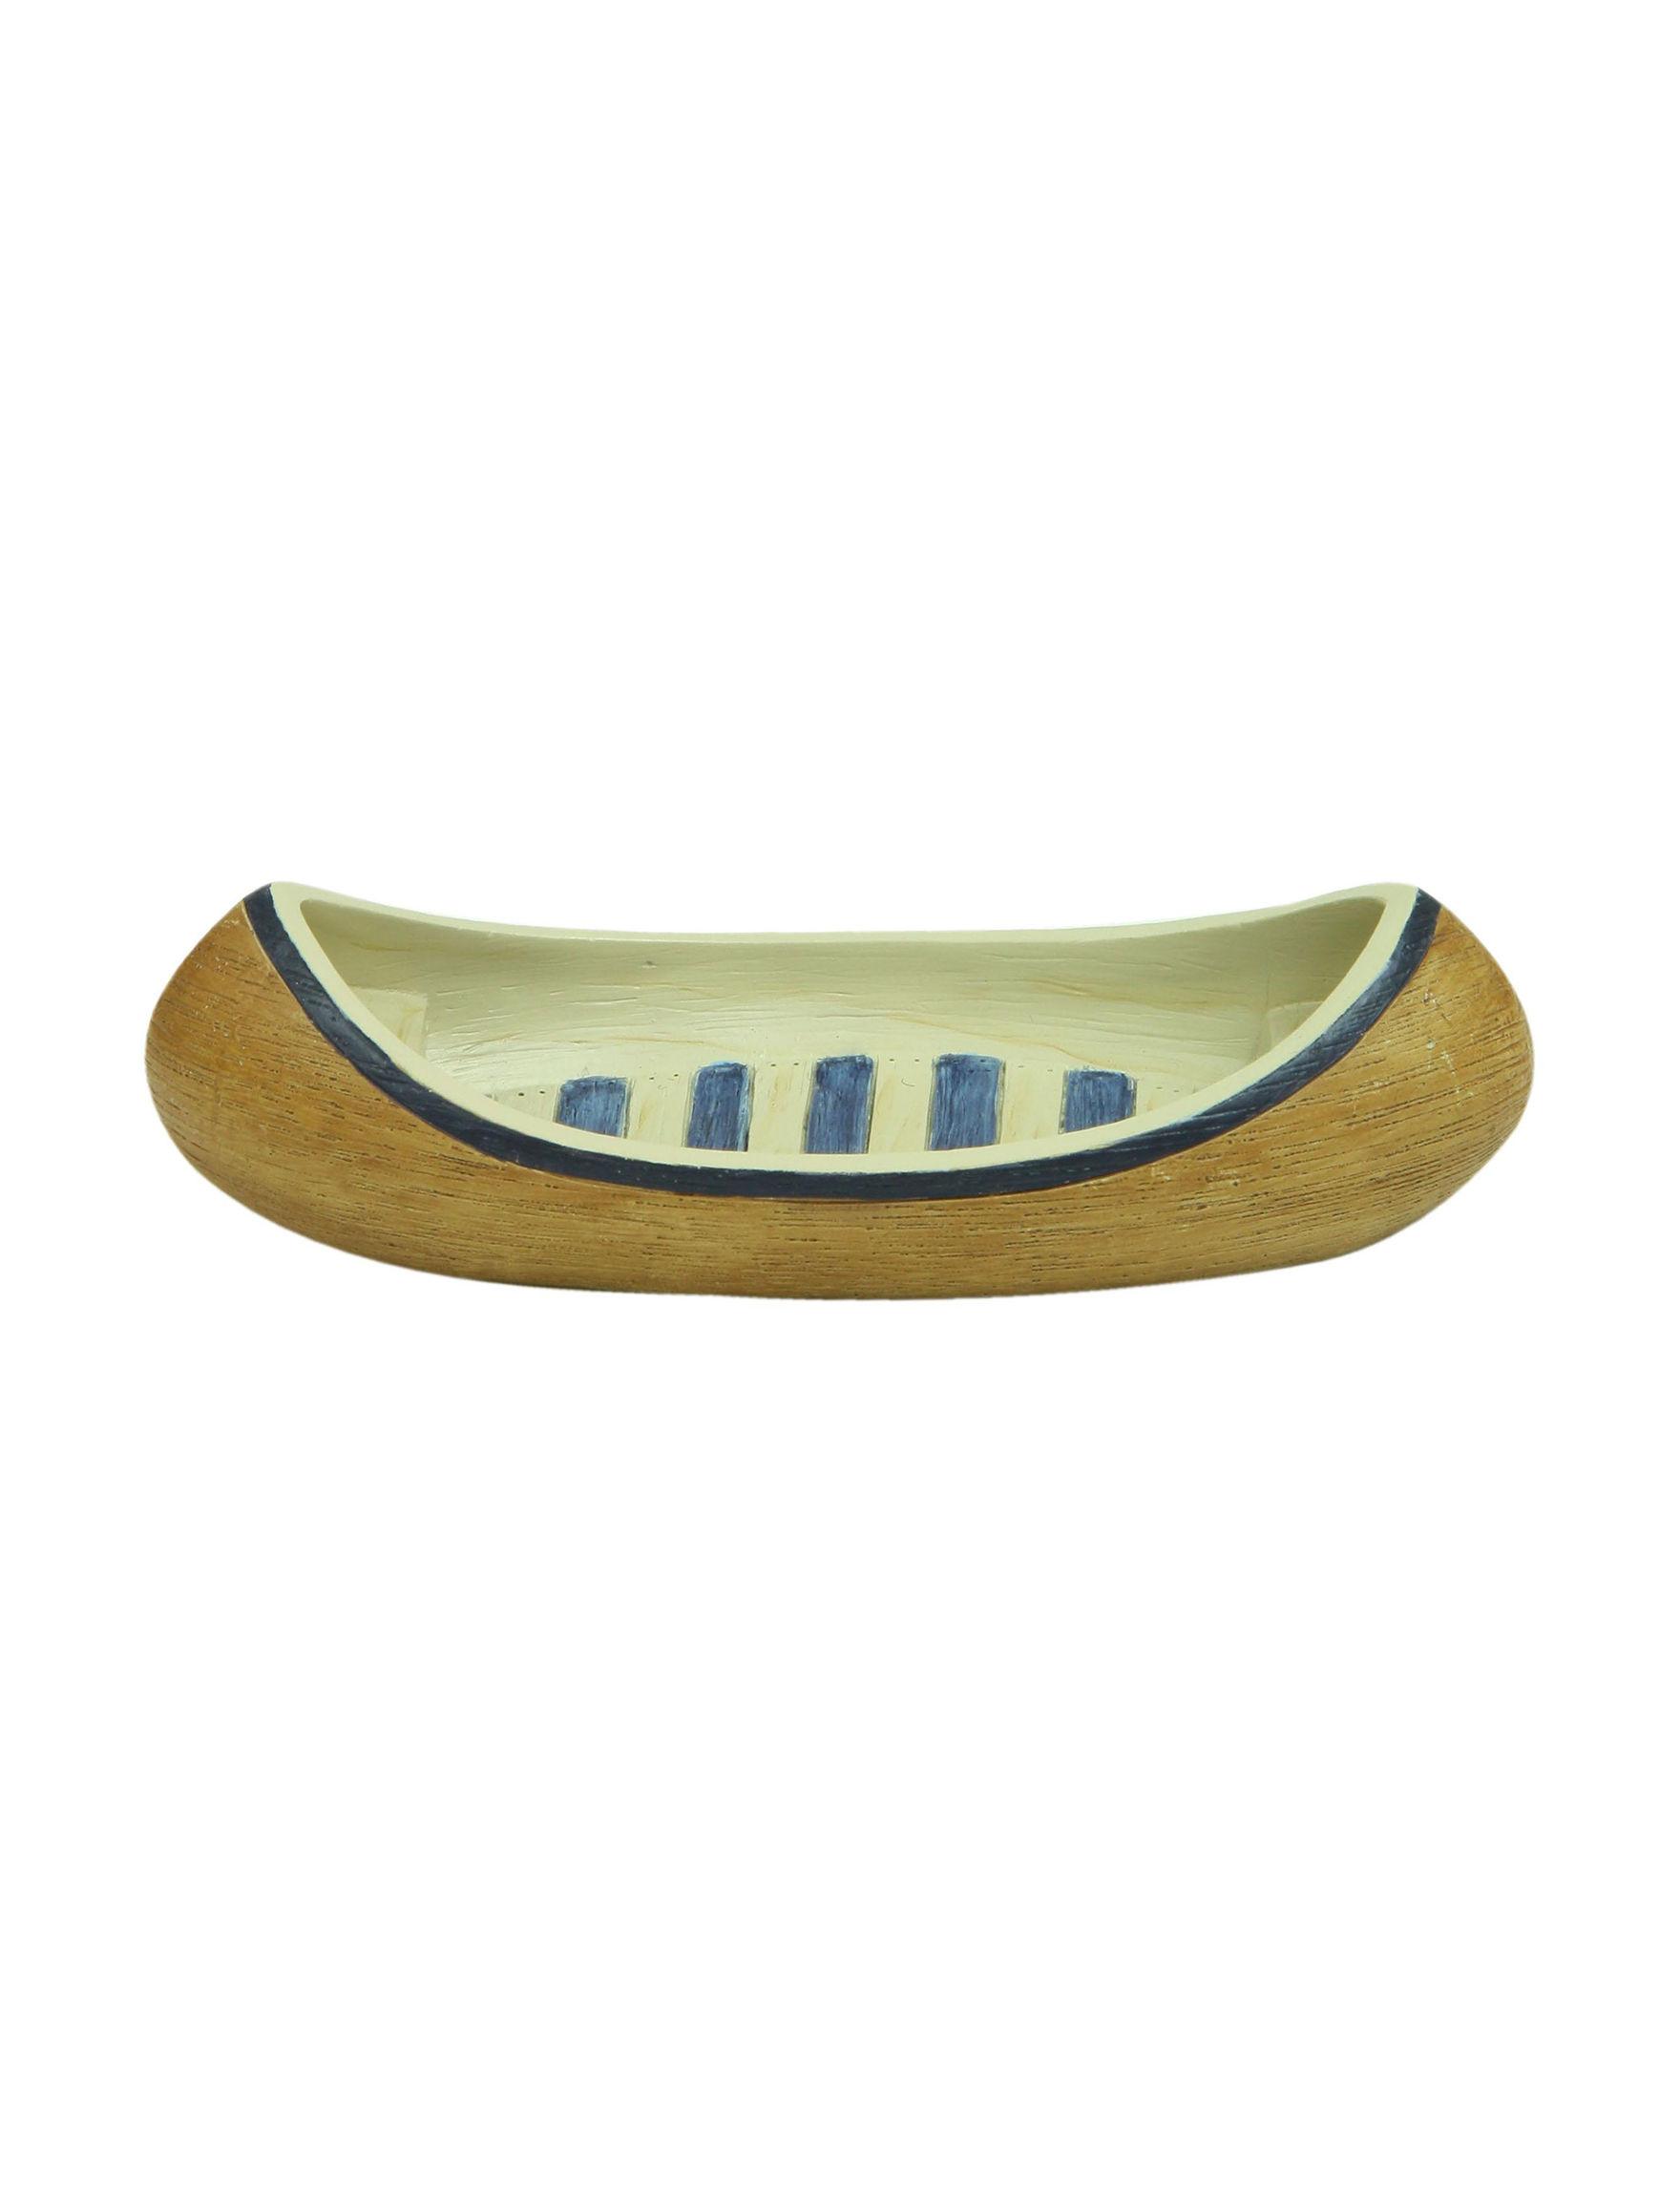 Bacova Guild Brown / Blue Soap Dishes Bath Accessories